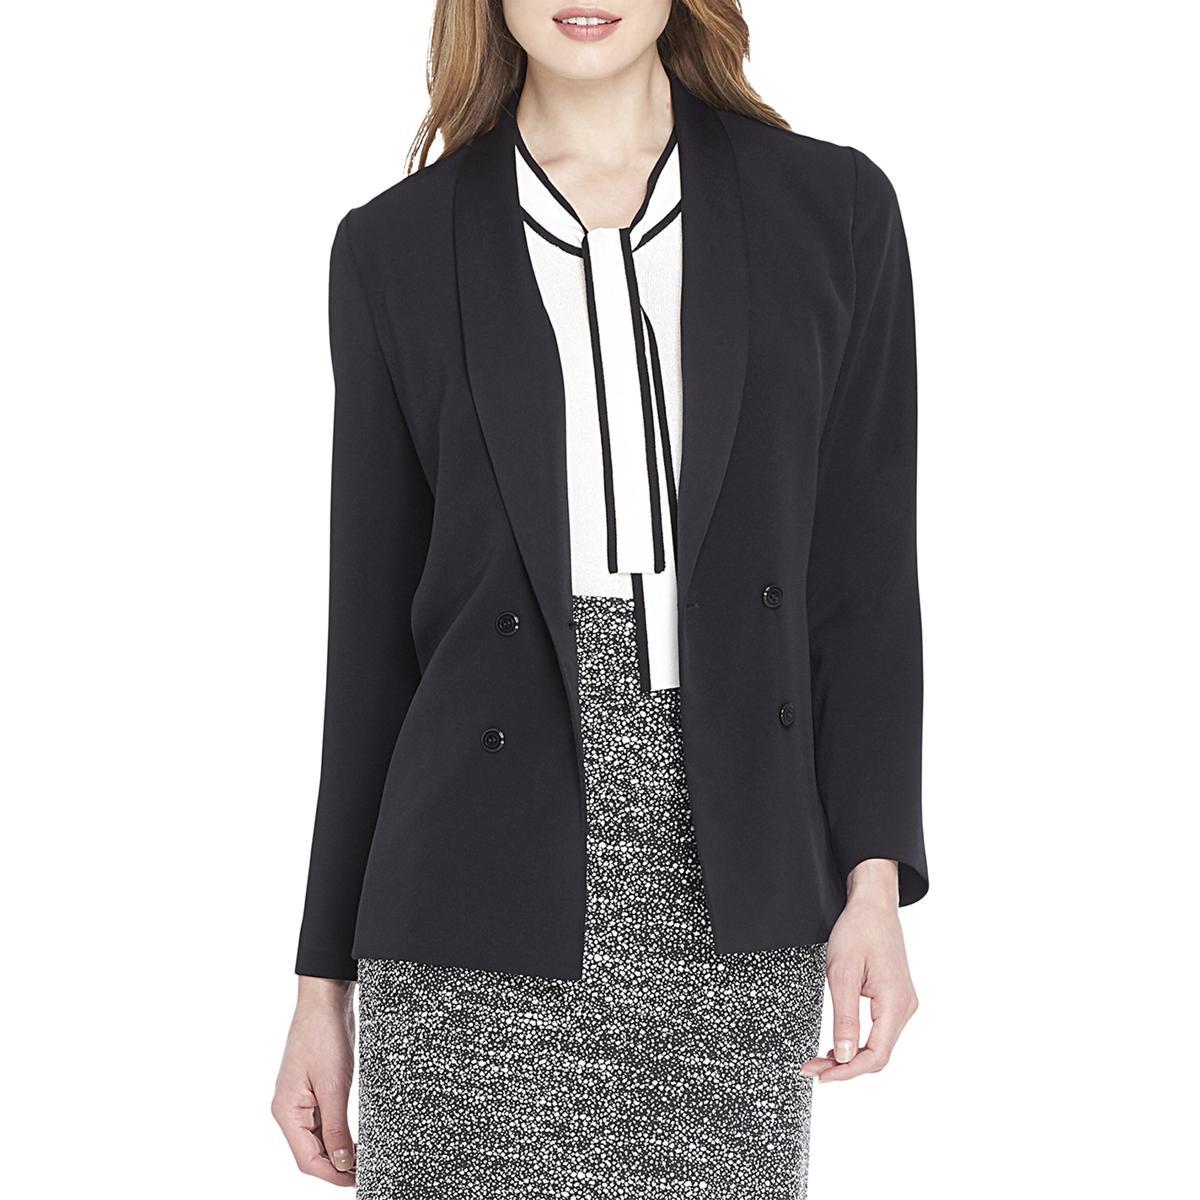 b0b6f8edf64e Details about Tahari ASL Womens Satin Trim Work Wear Business Blazer BHFO  5362